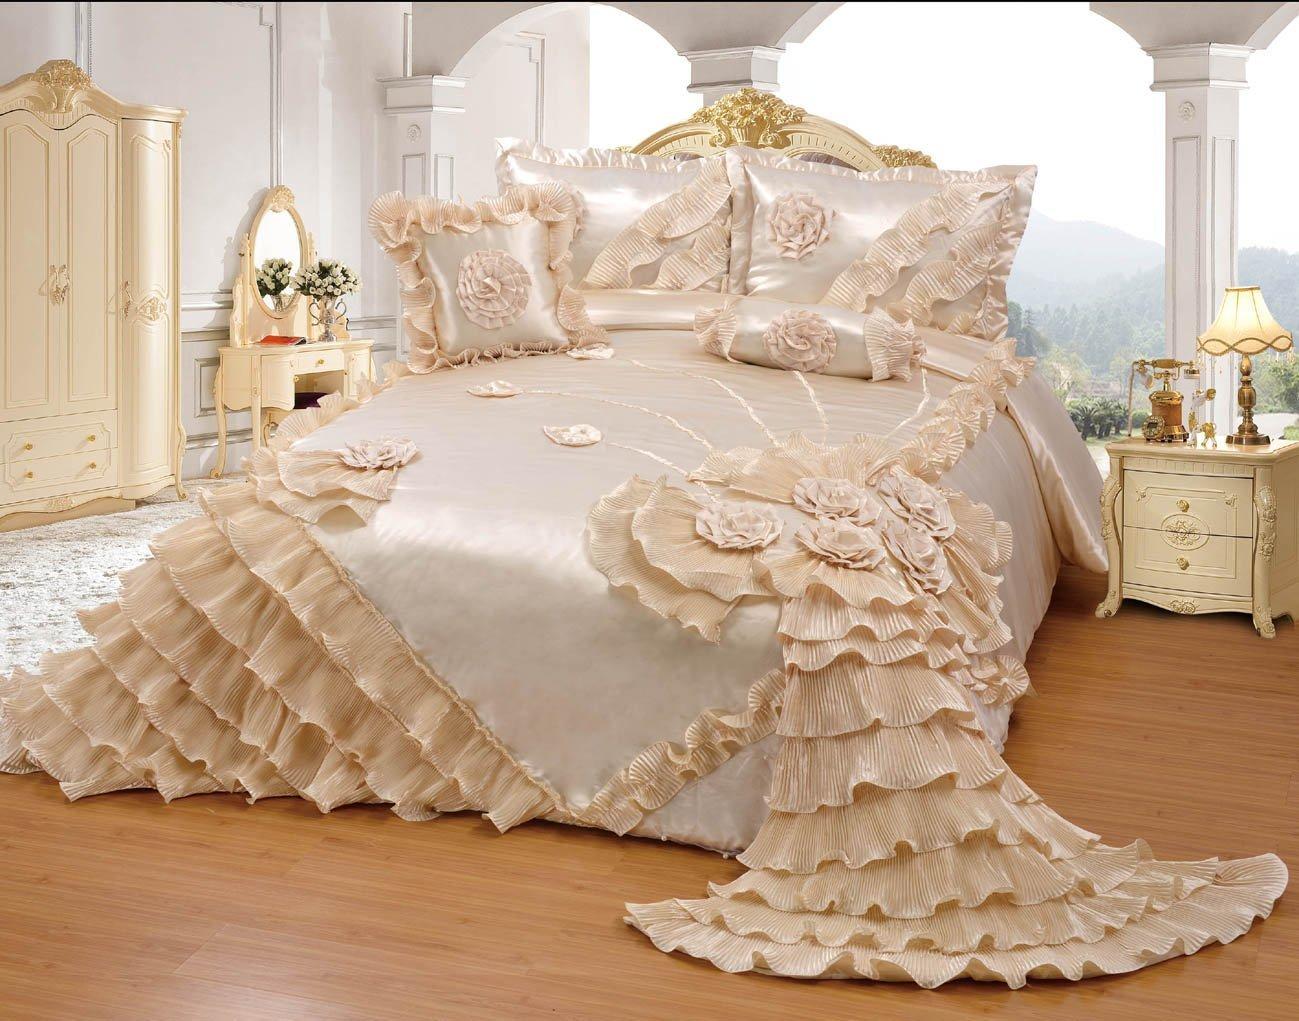 Octorose Royalty Oversize Wedding Bedding Bedspread Comforter Set (BP-H1-K, Cream) by OctoRose